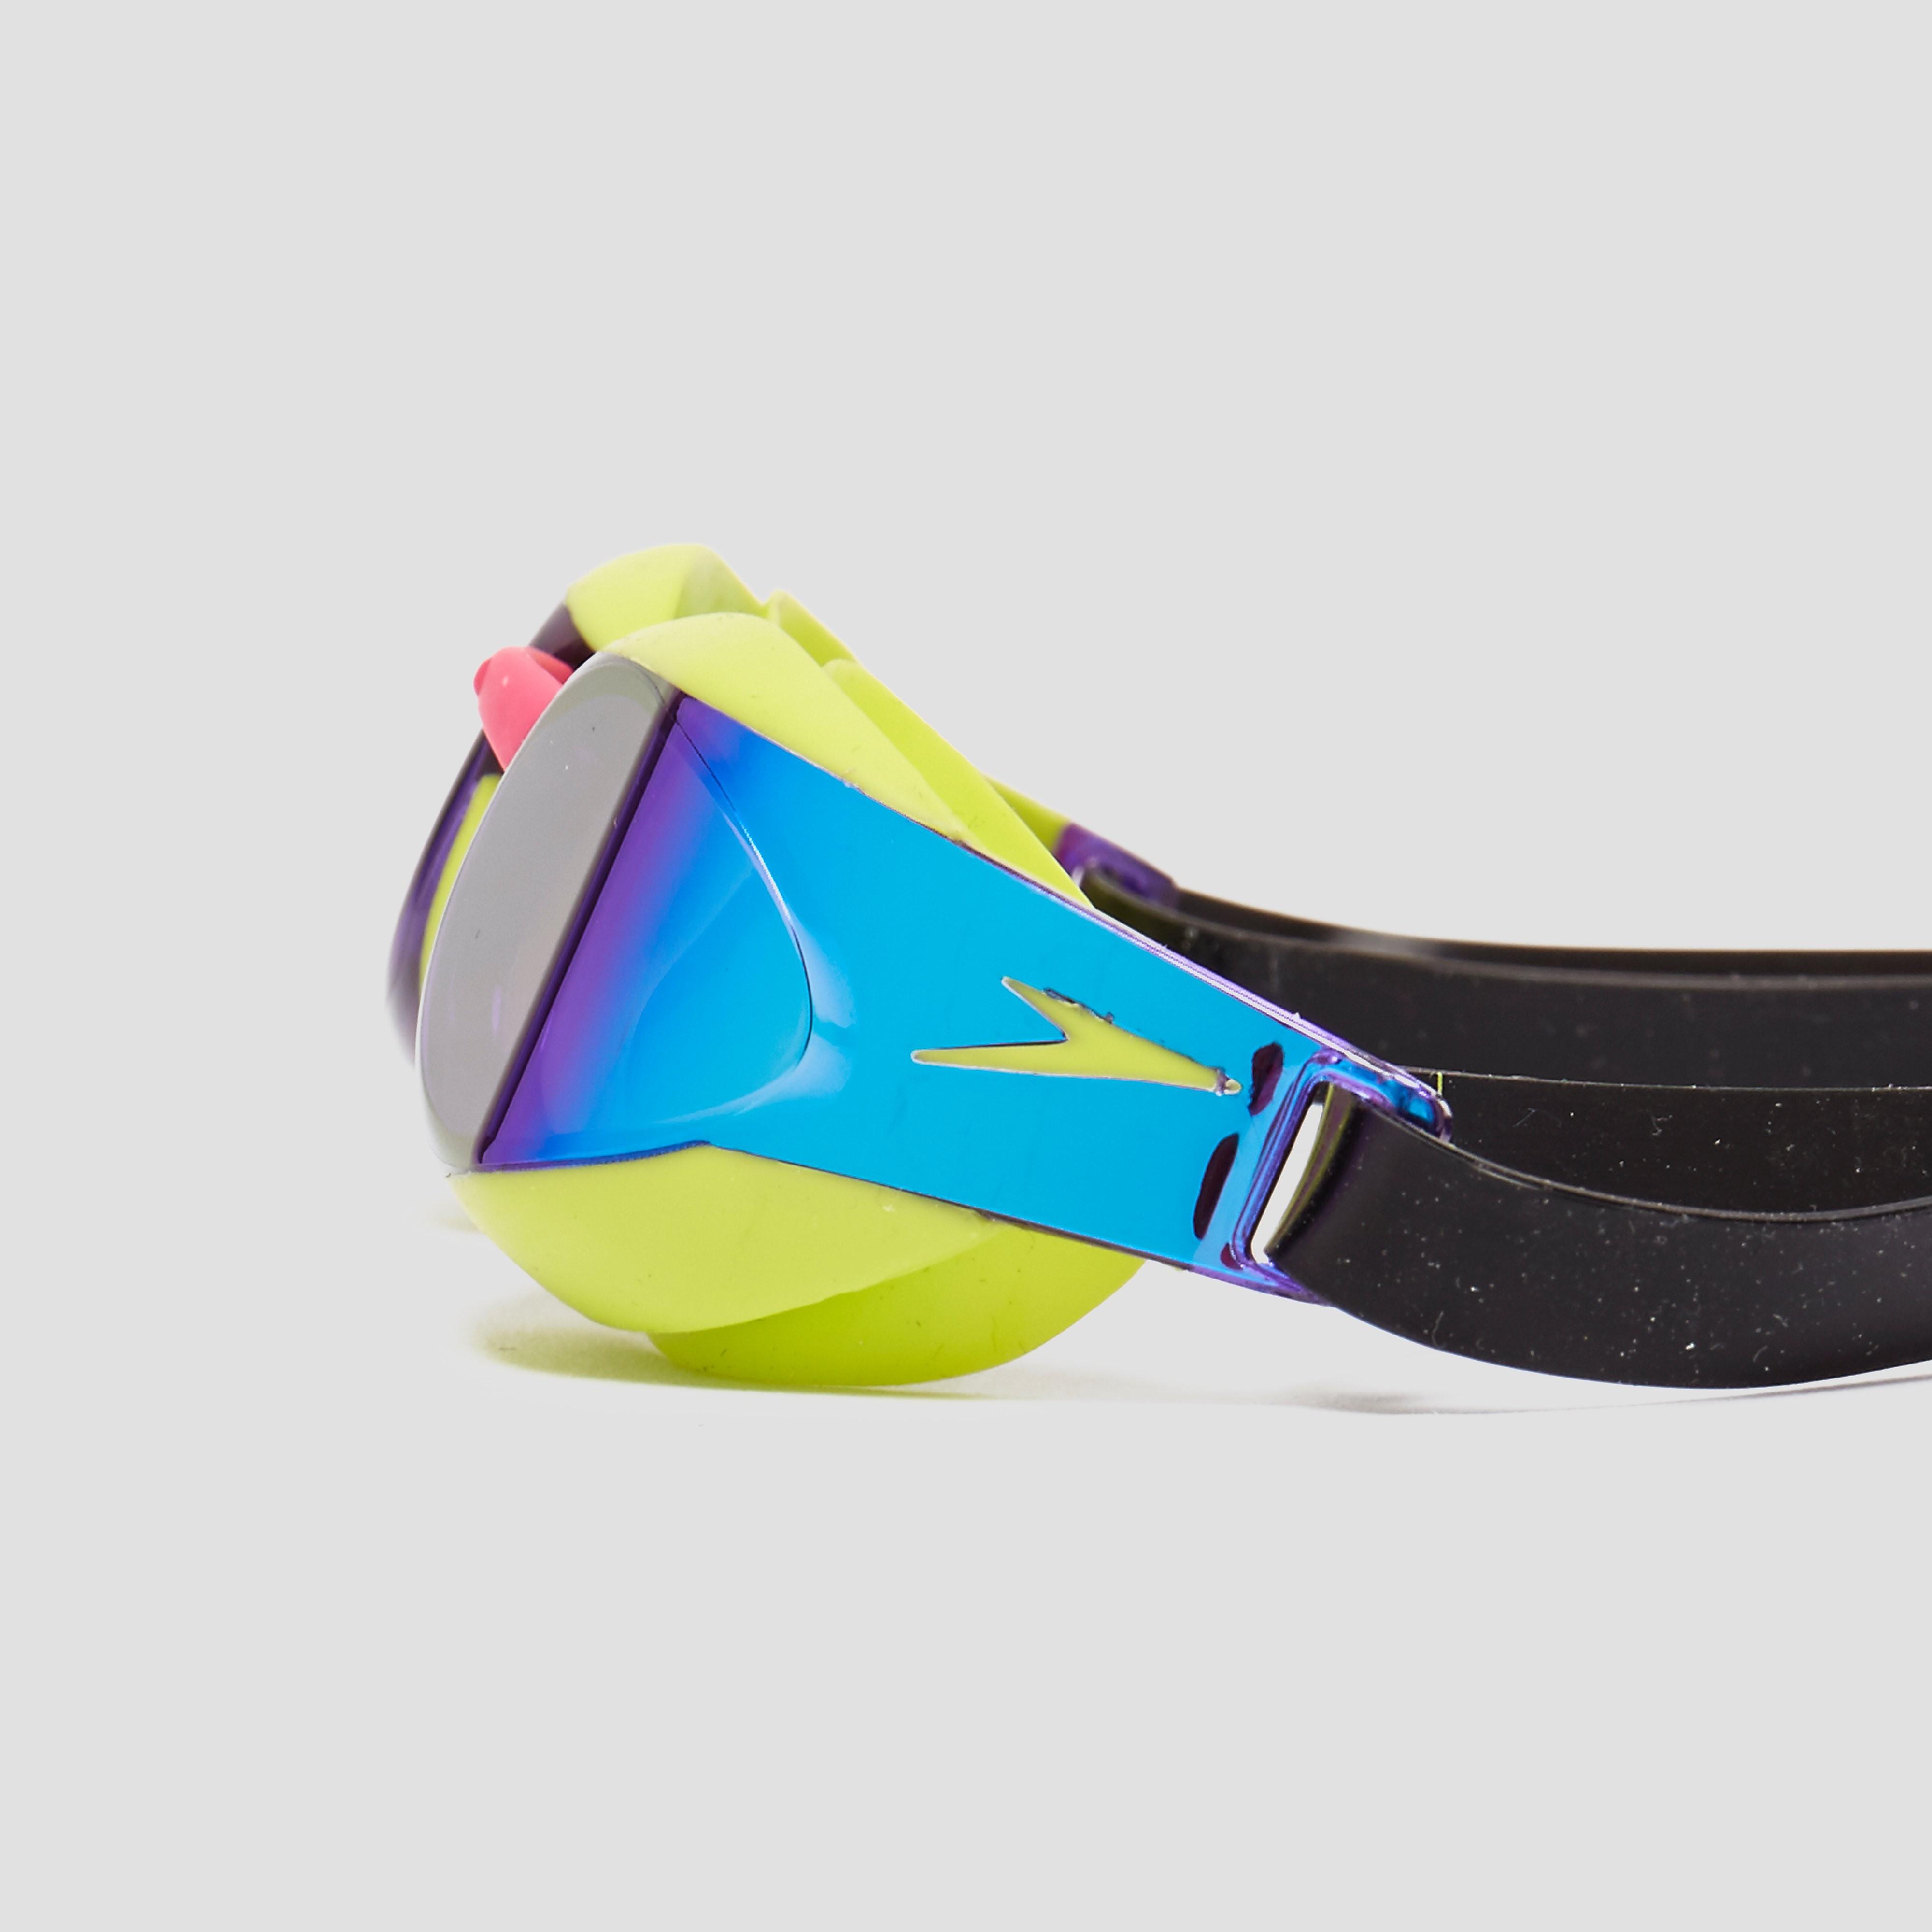 Speedo Fastskin Elite Mirror Unisex Swimming Goggles